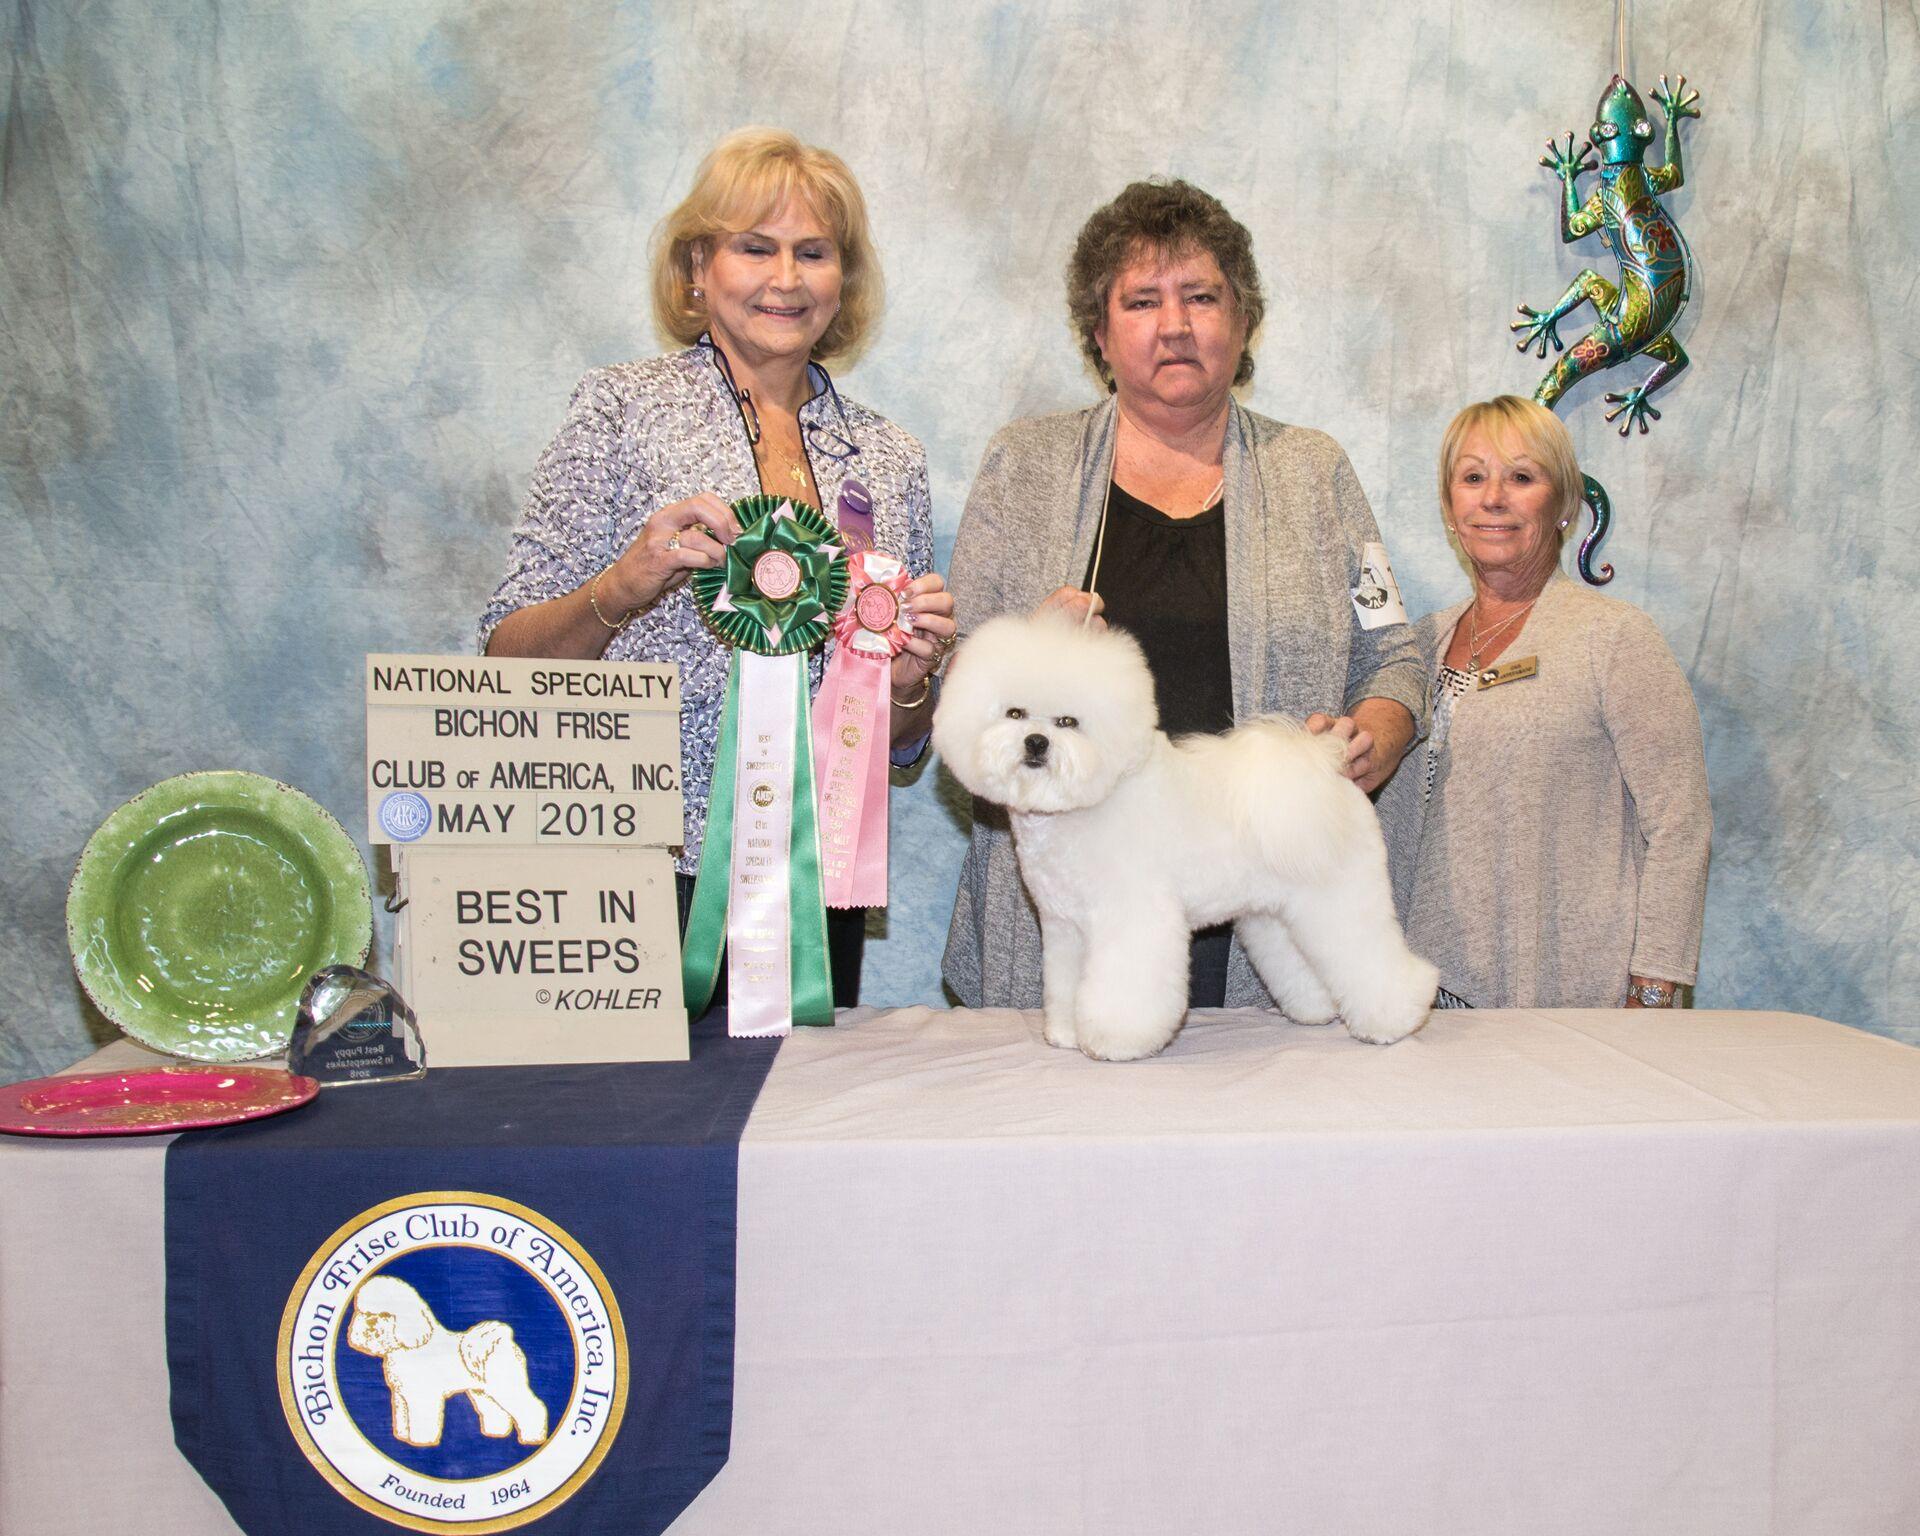 Bichon Frise Club of America | Member of American Kennel Club